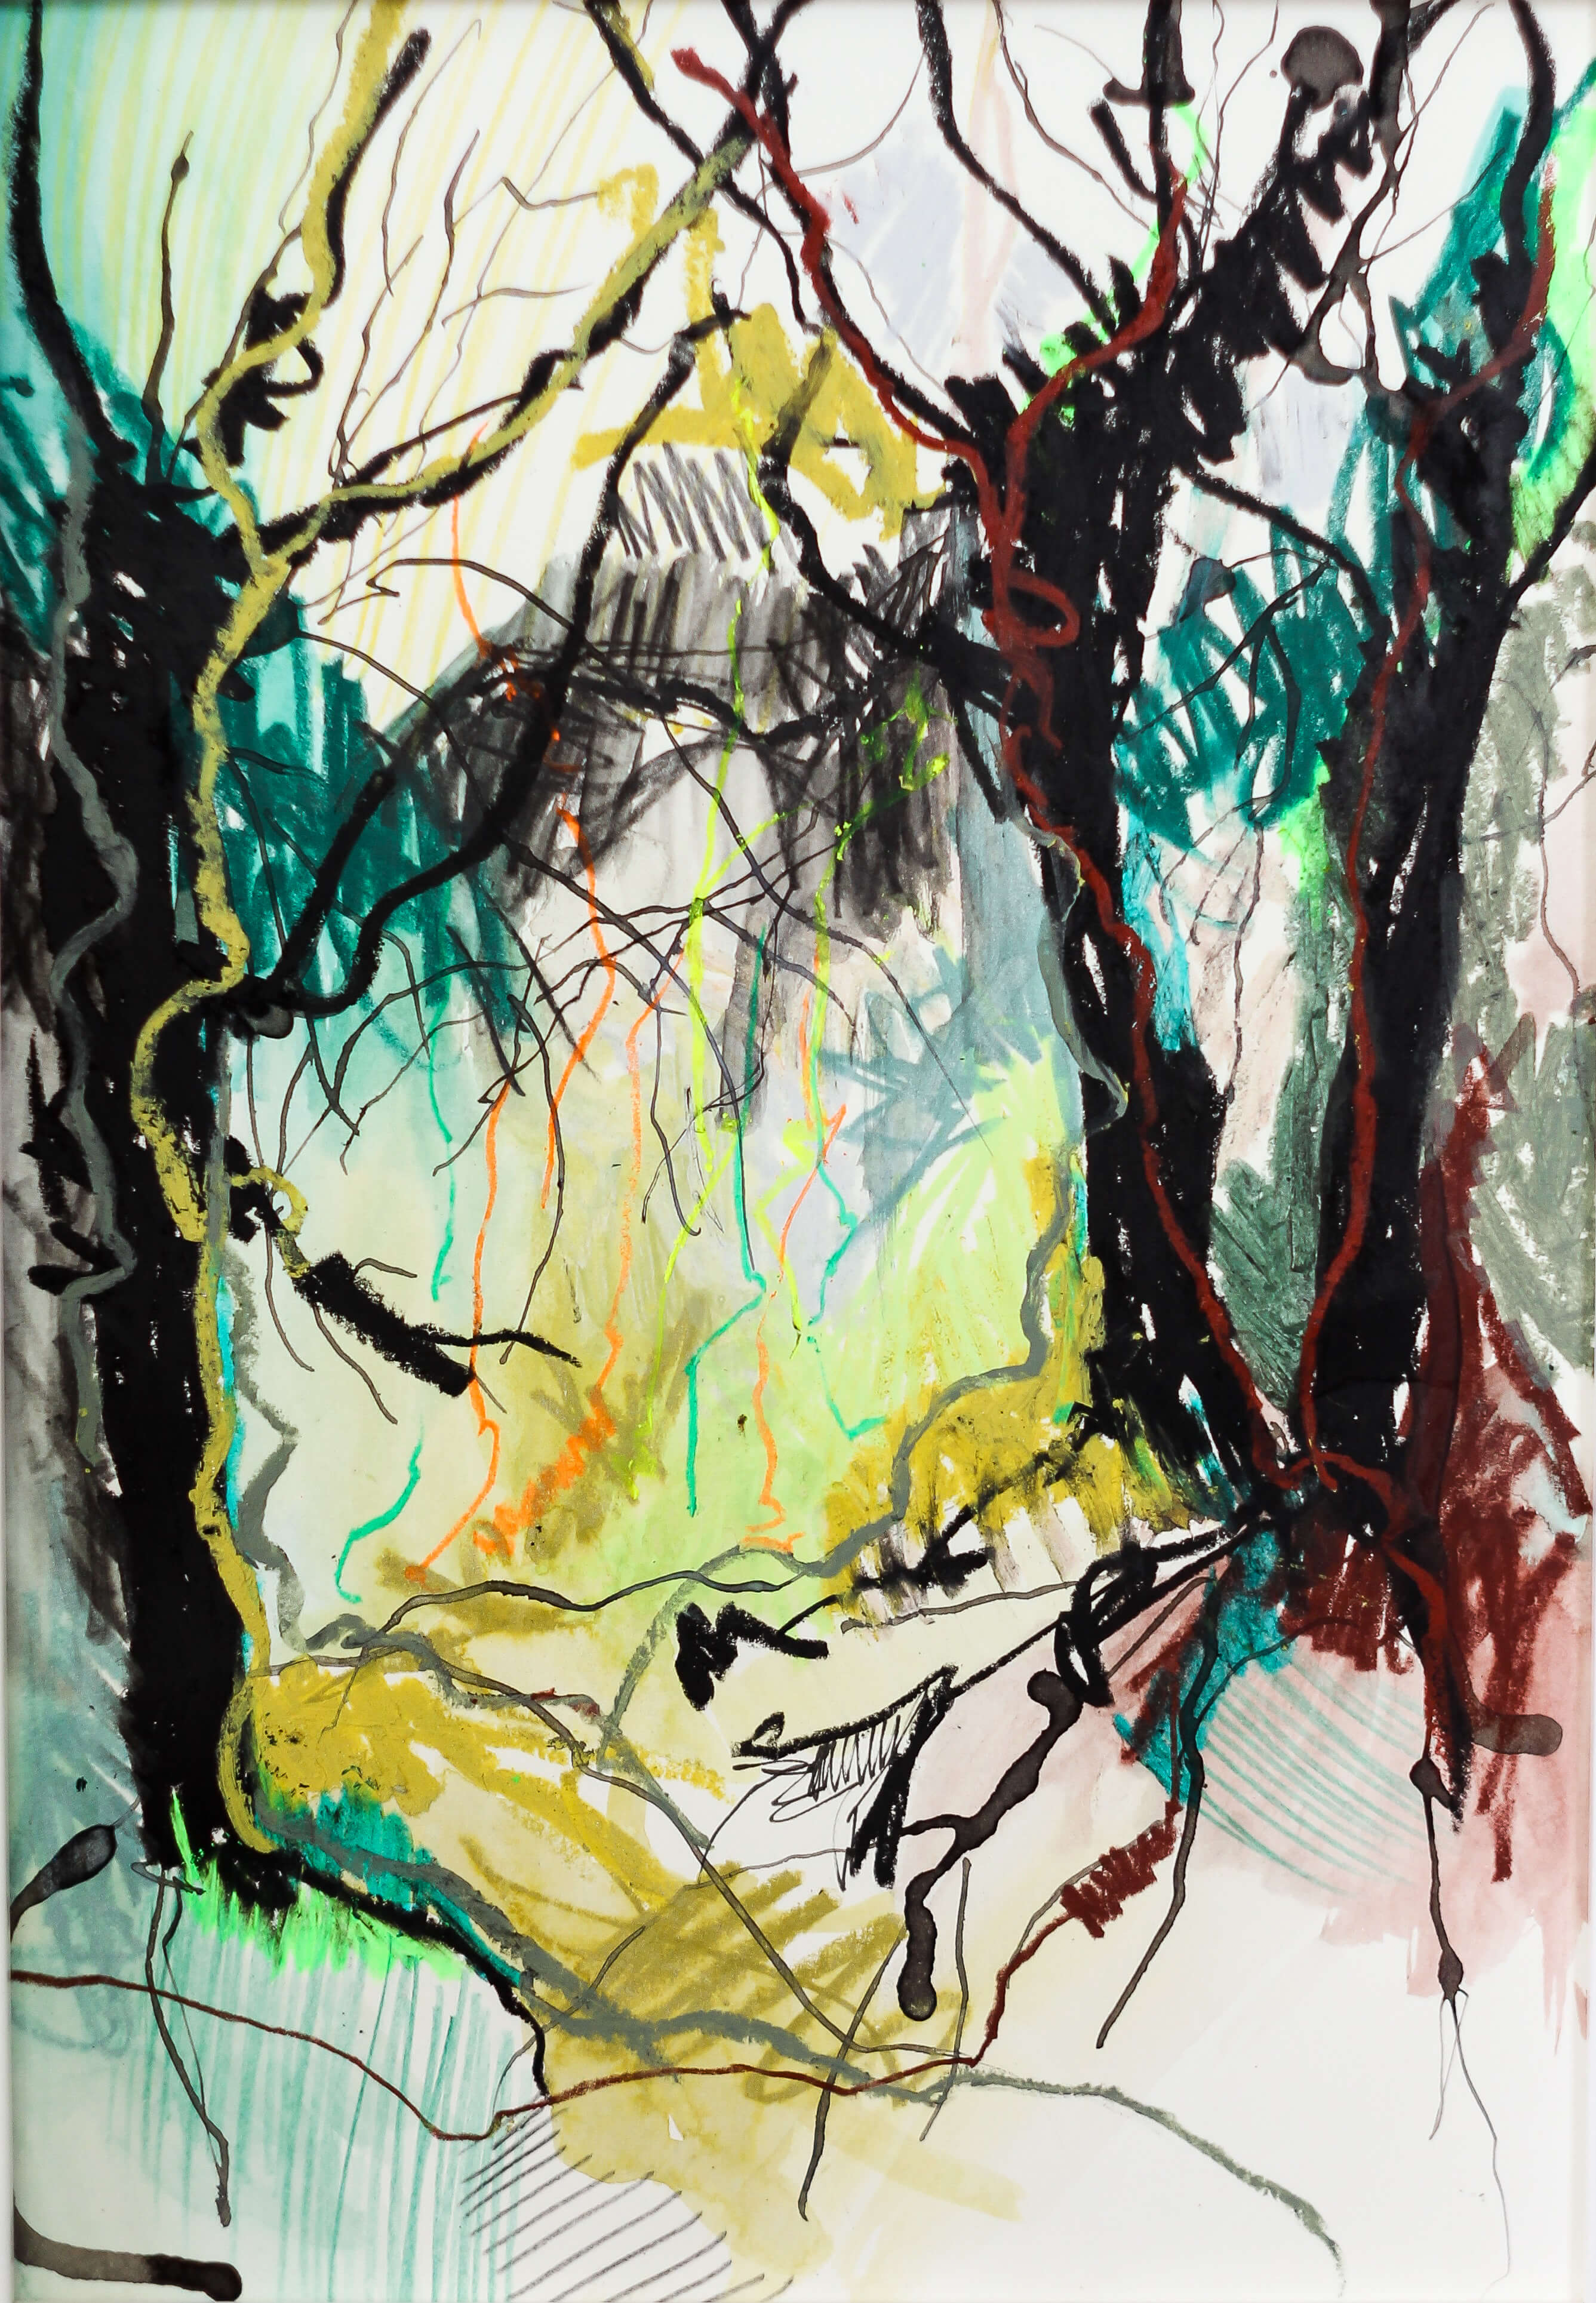 Katharina Albers, Wald V, 2014, Ölkreide, Tusche, Aquarell, Graphit auf Papier, 29,7×21 cm